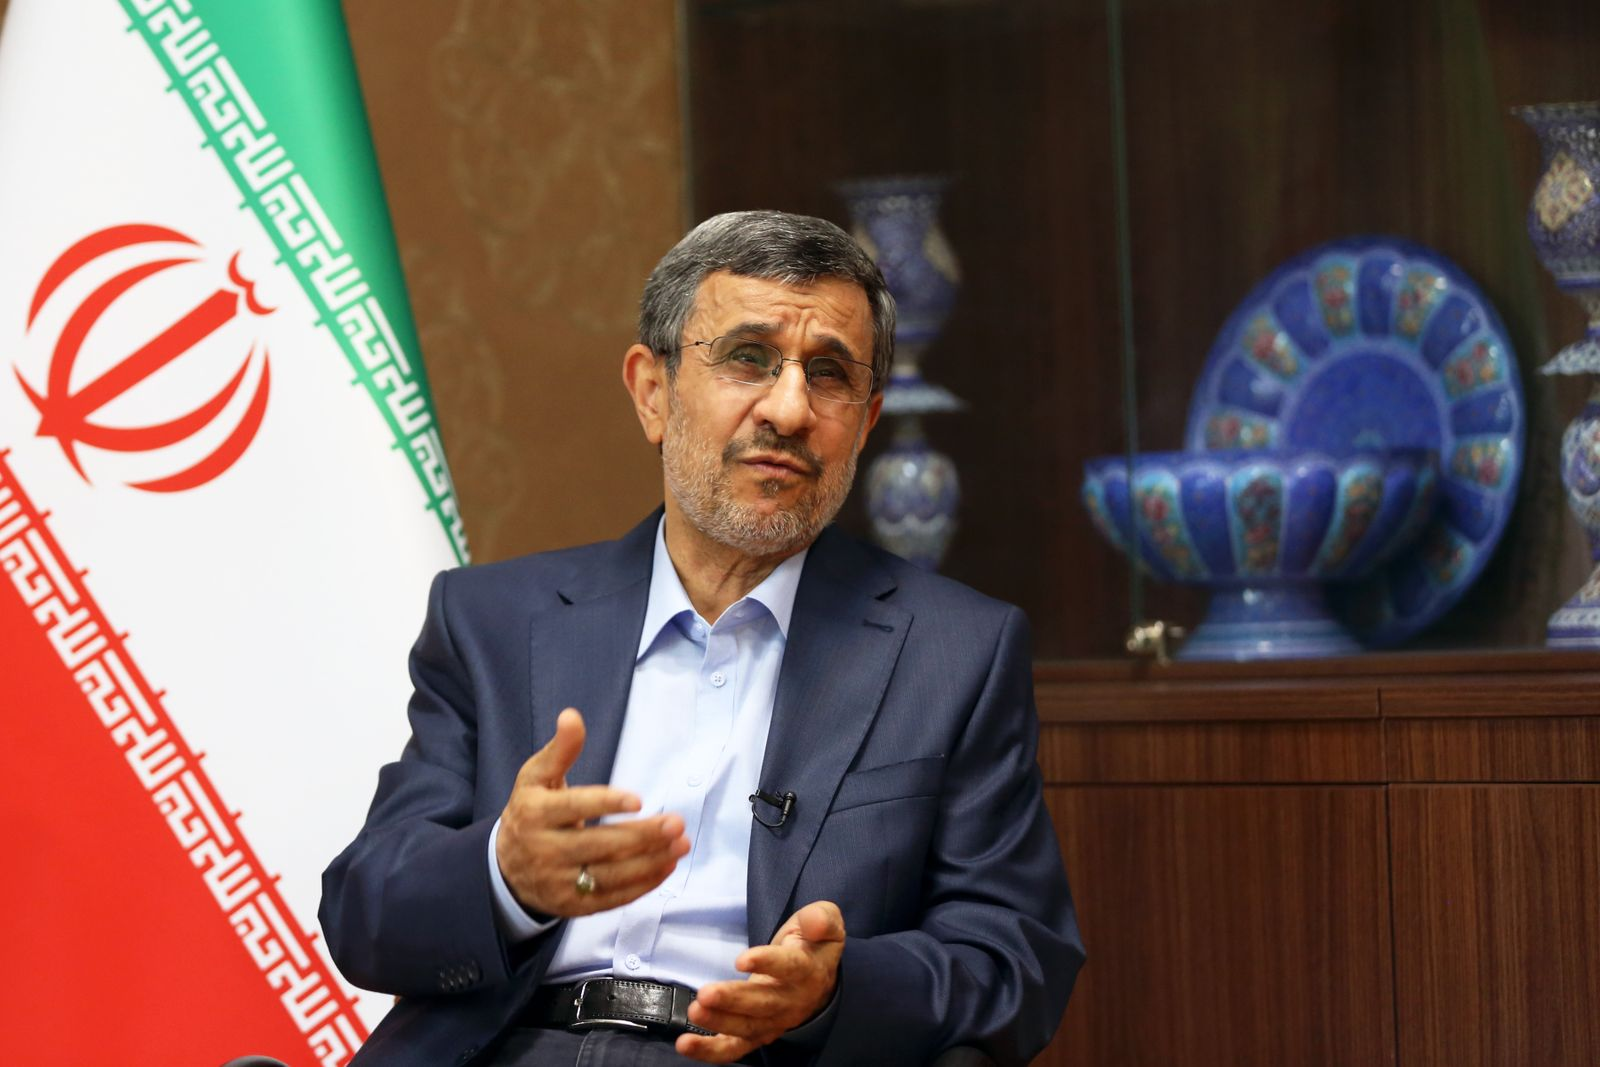 Iranian former President Mahmoud Ahmadinejad